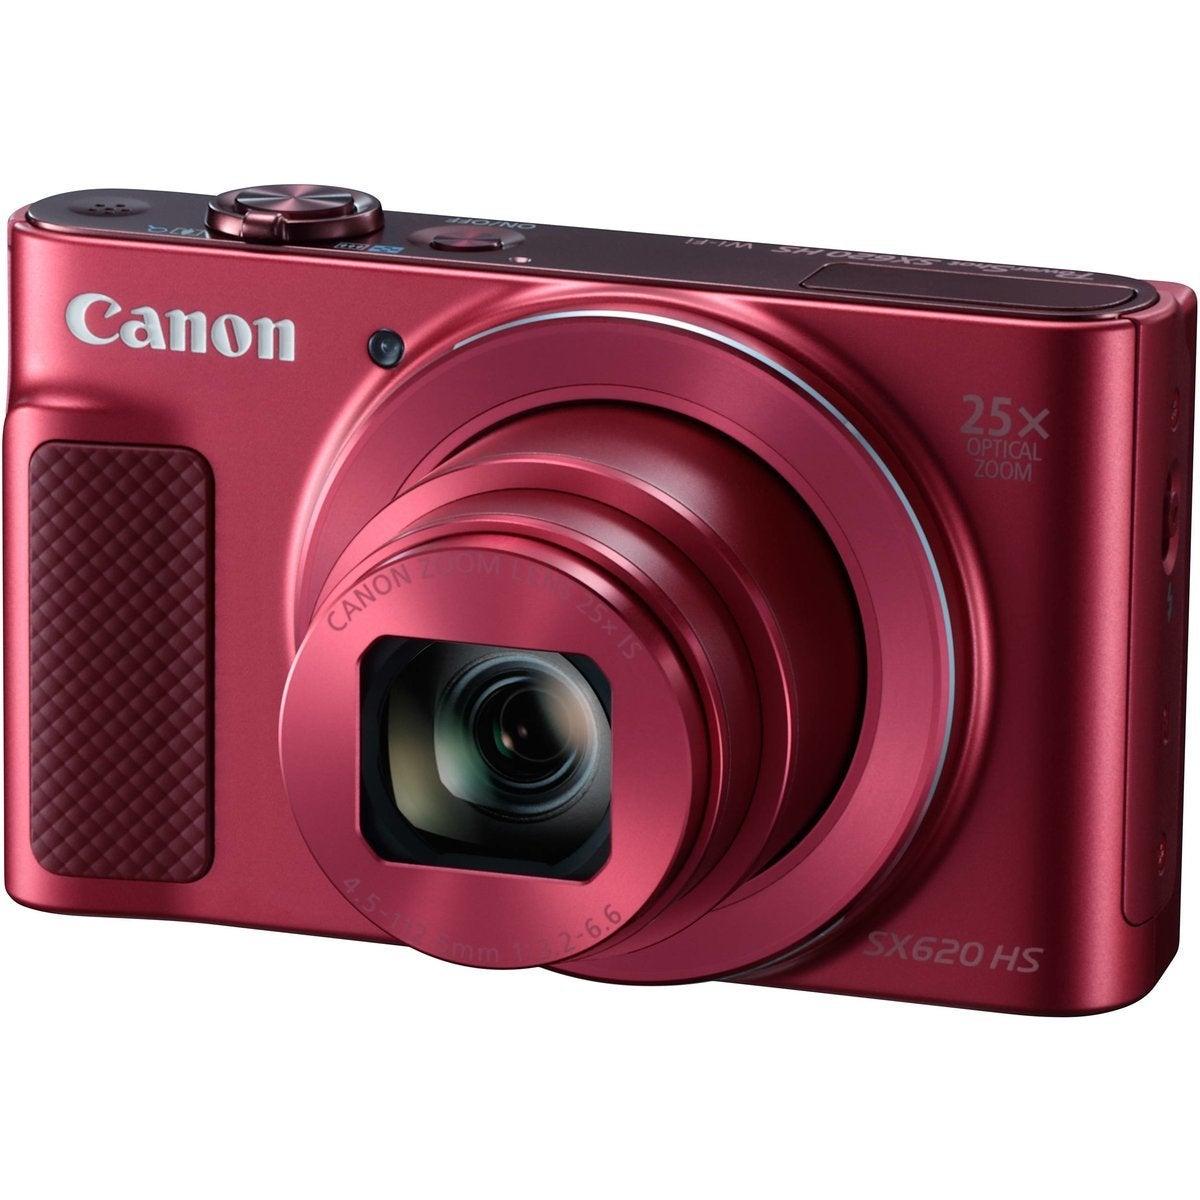 Canon Powershot SX620HS Digital Camera